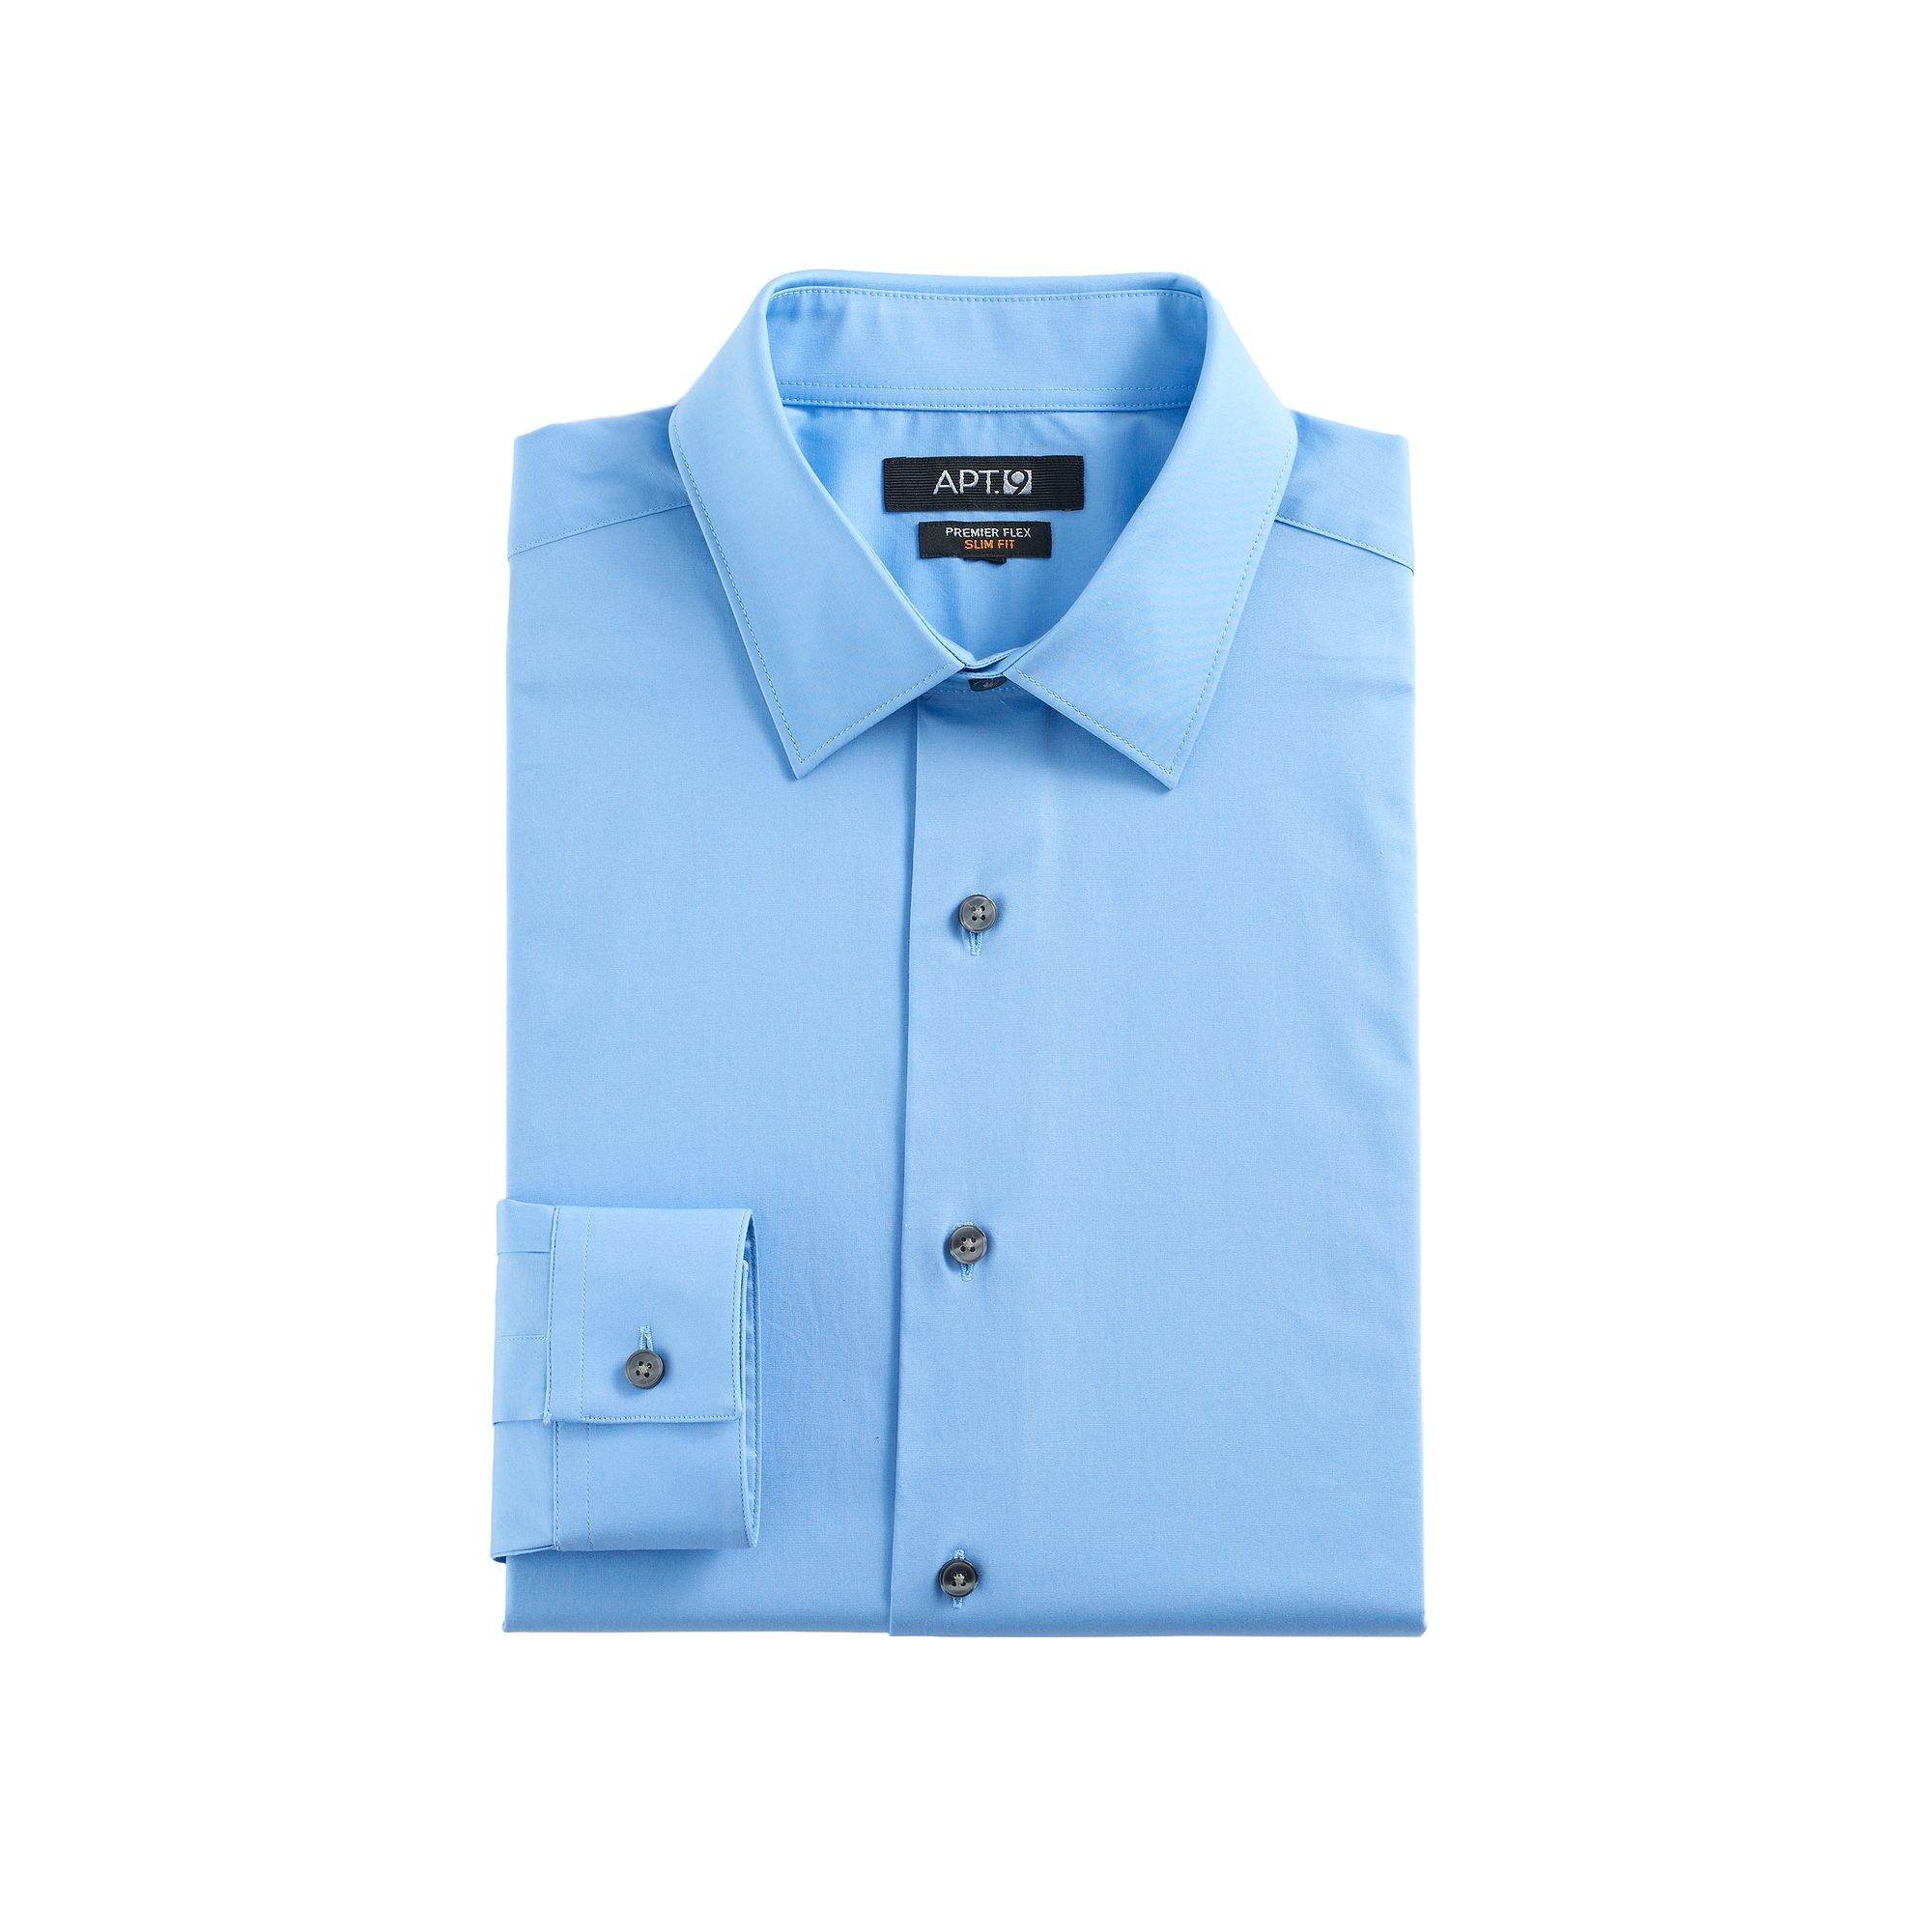 Green dress shirt mens Menus Apt SlimFit Premier Flex Collar Stretch Dress Shirt